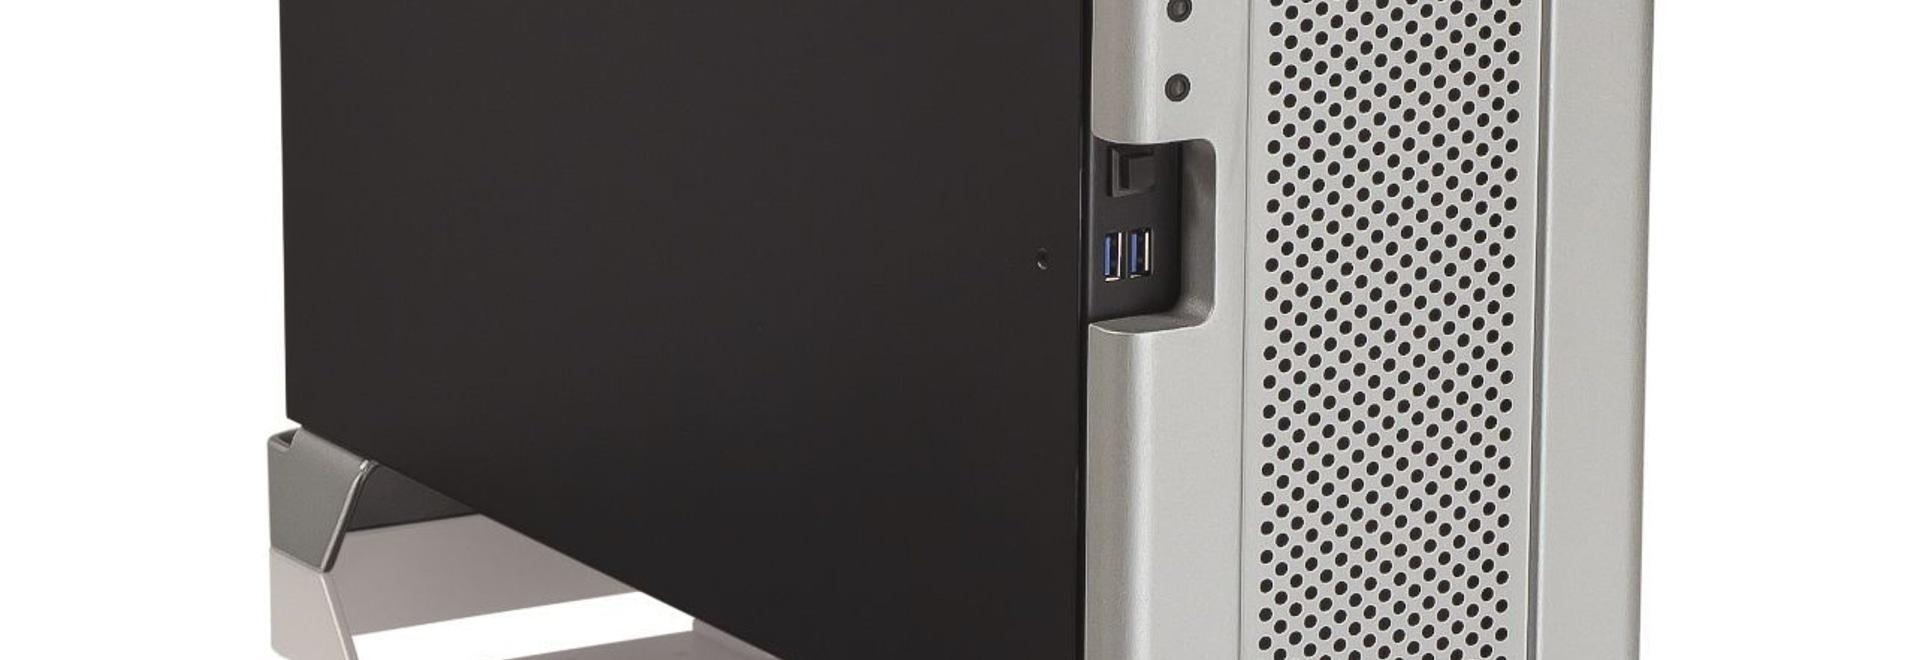 Kontron KISS 4U V3 SKX: New High-Performance Computer Platform for Demanding and Noise Sensitive Environments